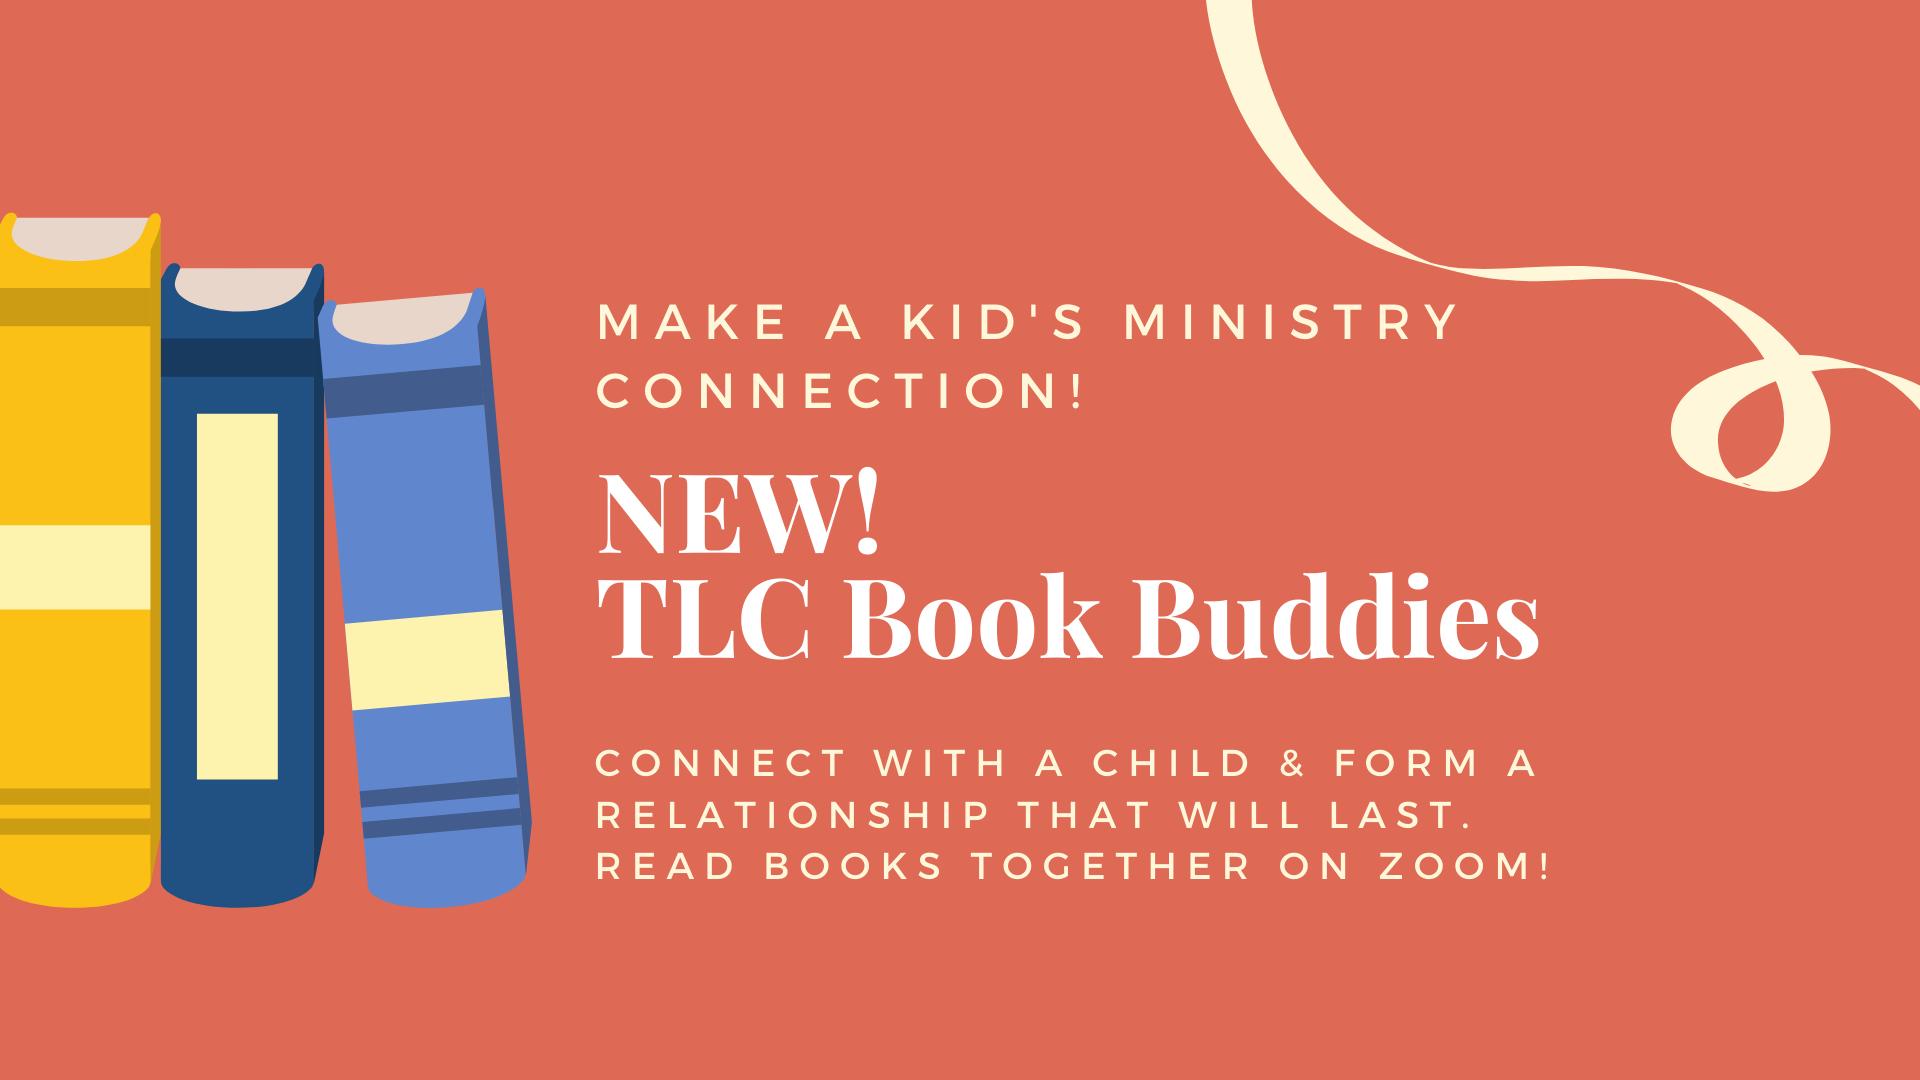 TLC Book Buddies